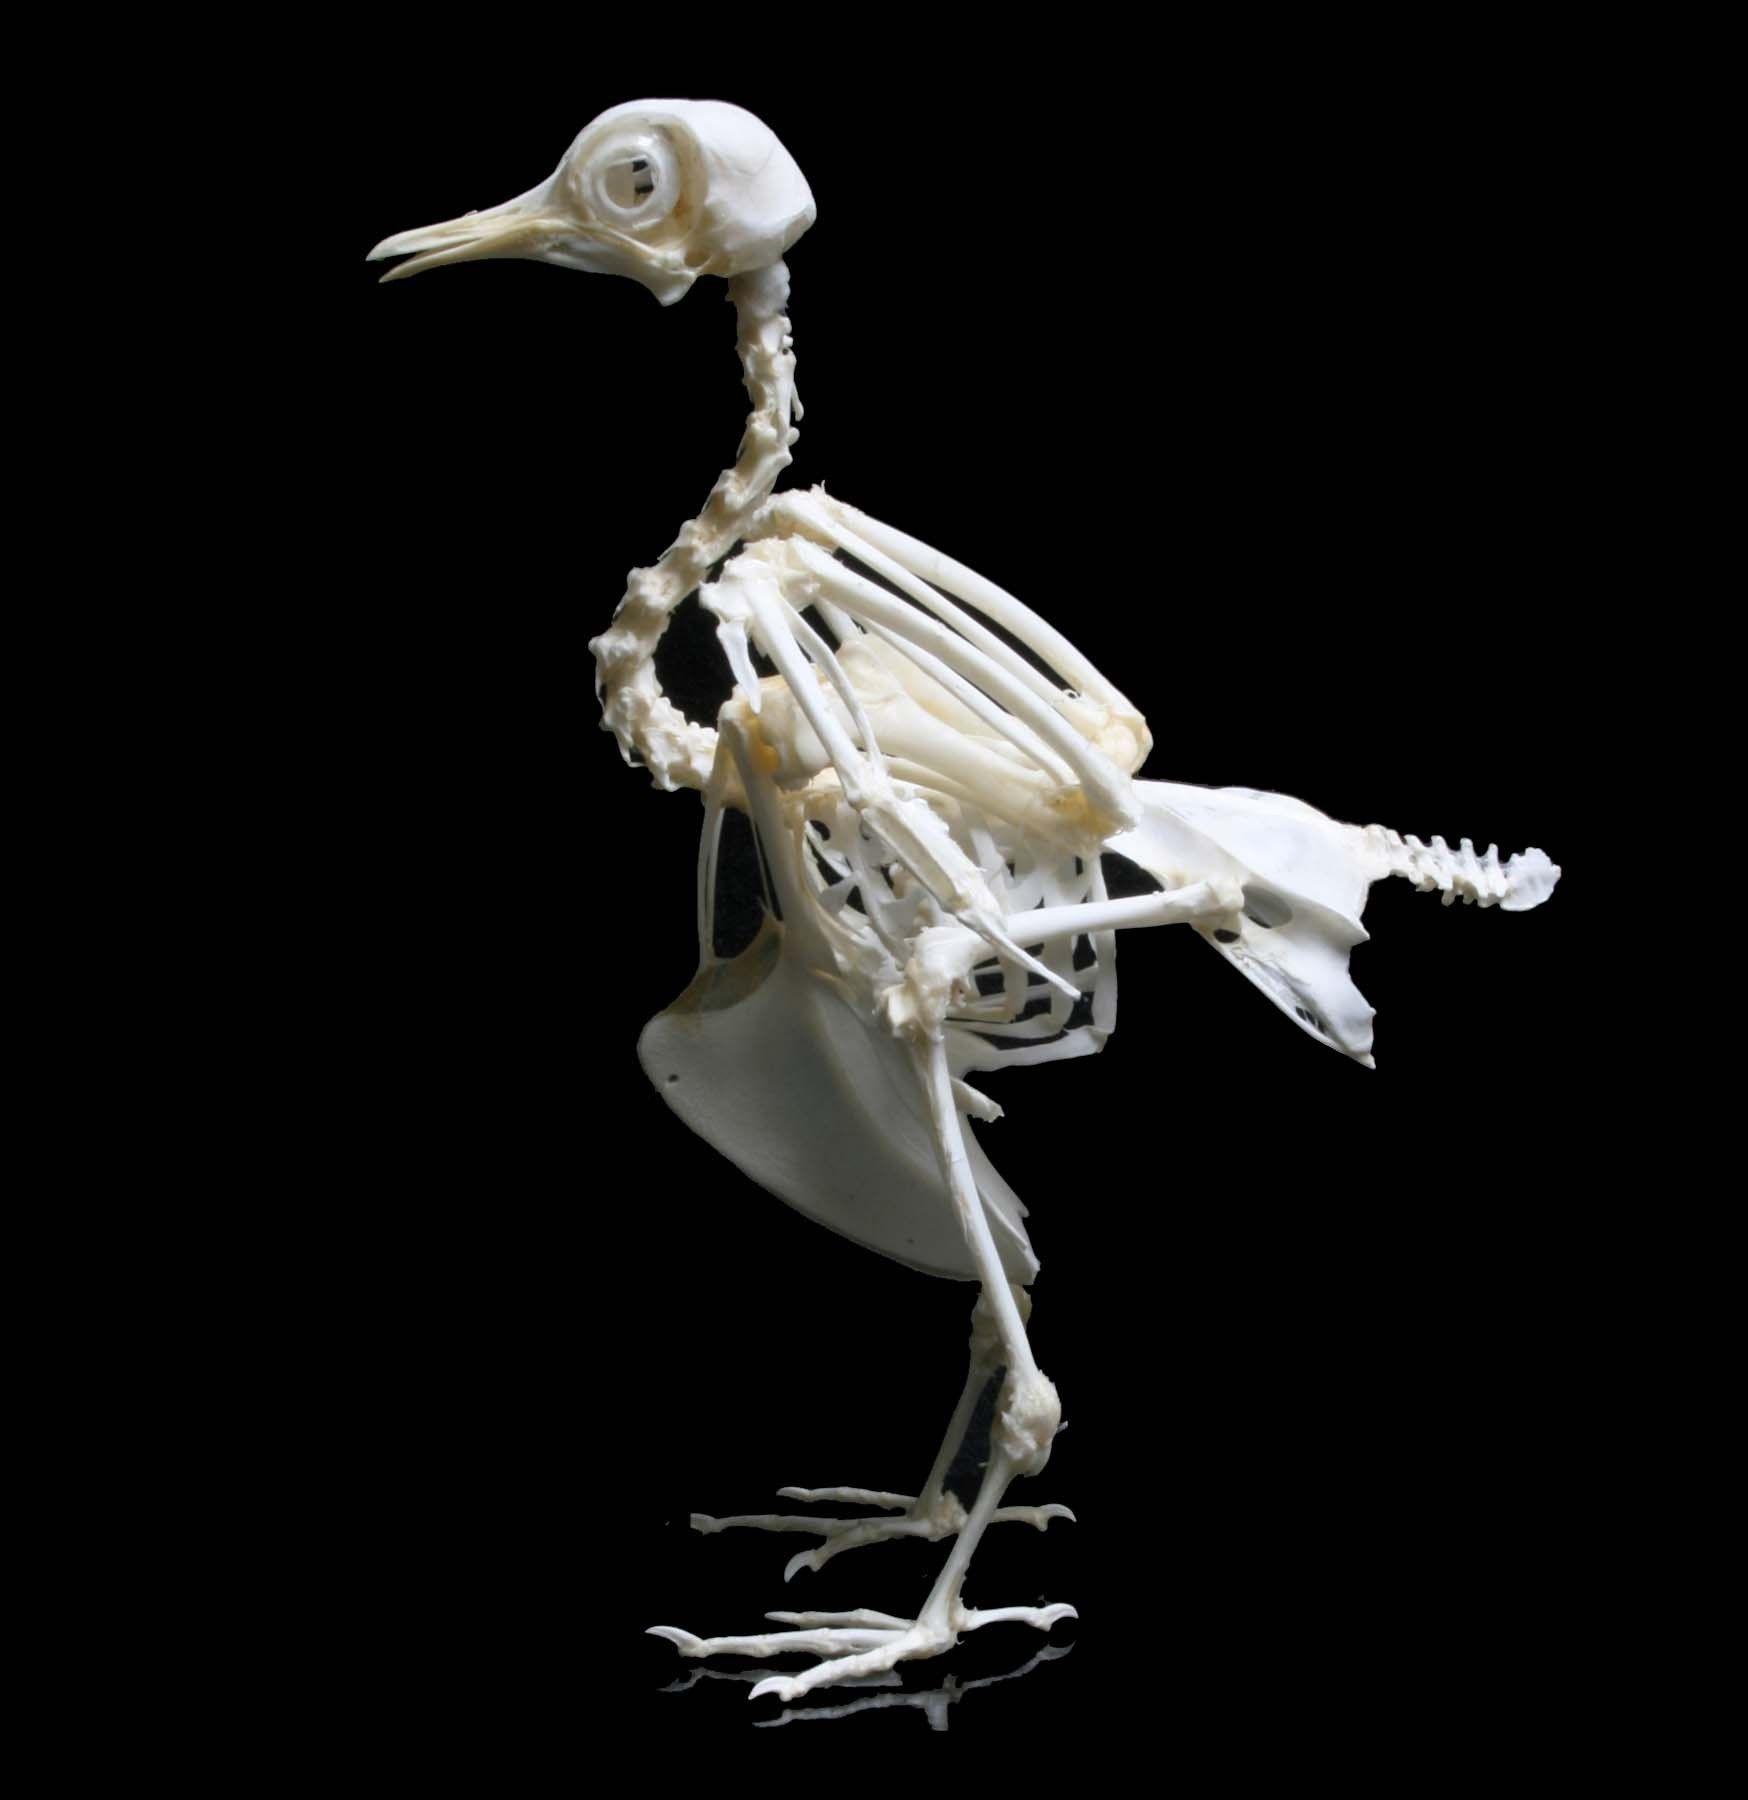 duck skeleton diagram nissan 2 5 engine articulated pigeon bones pinterest